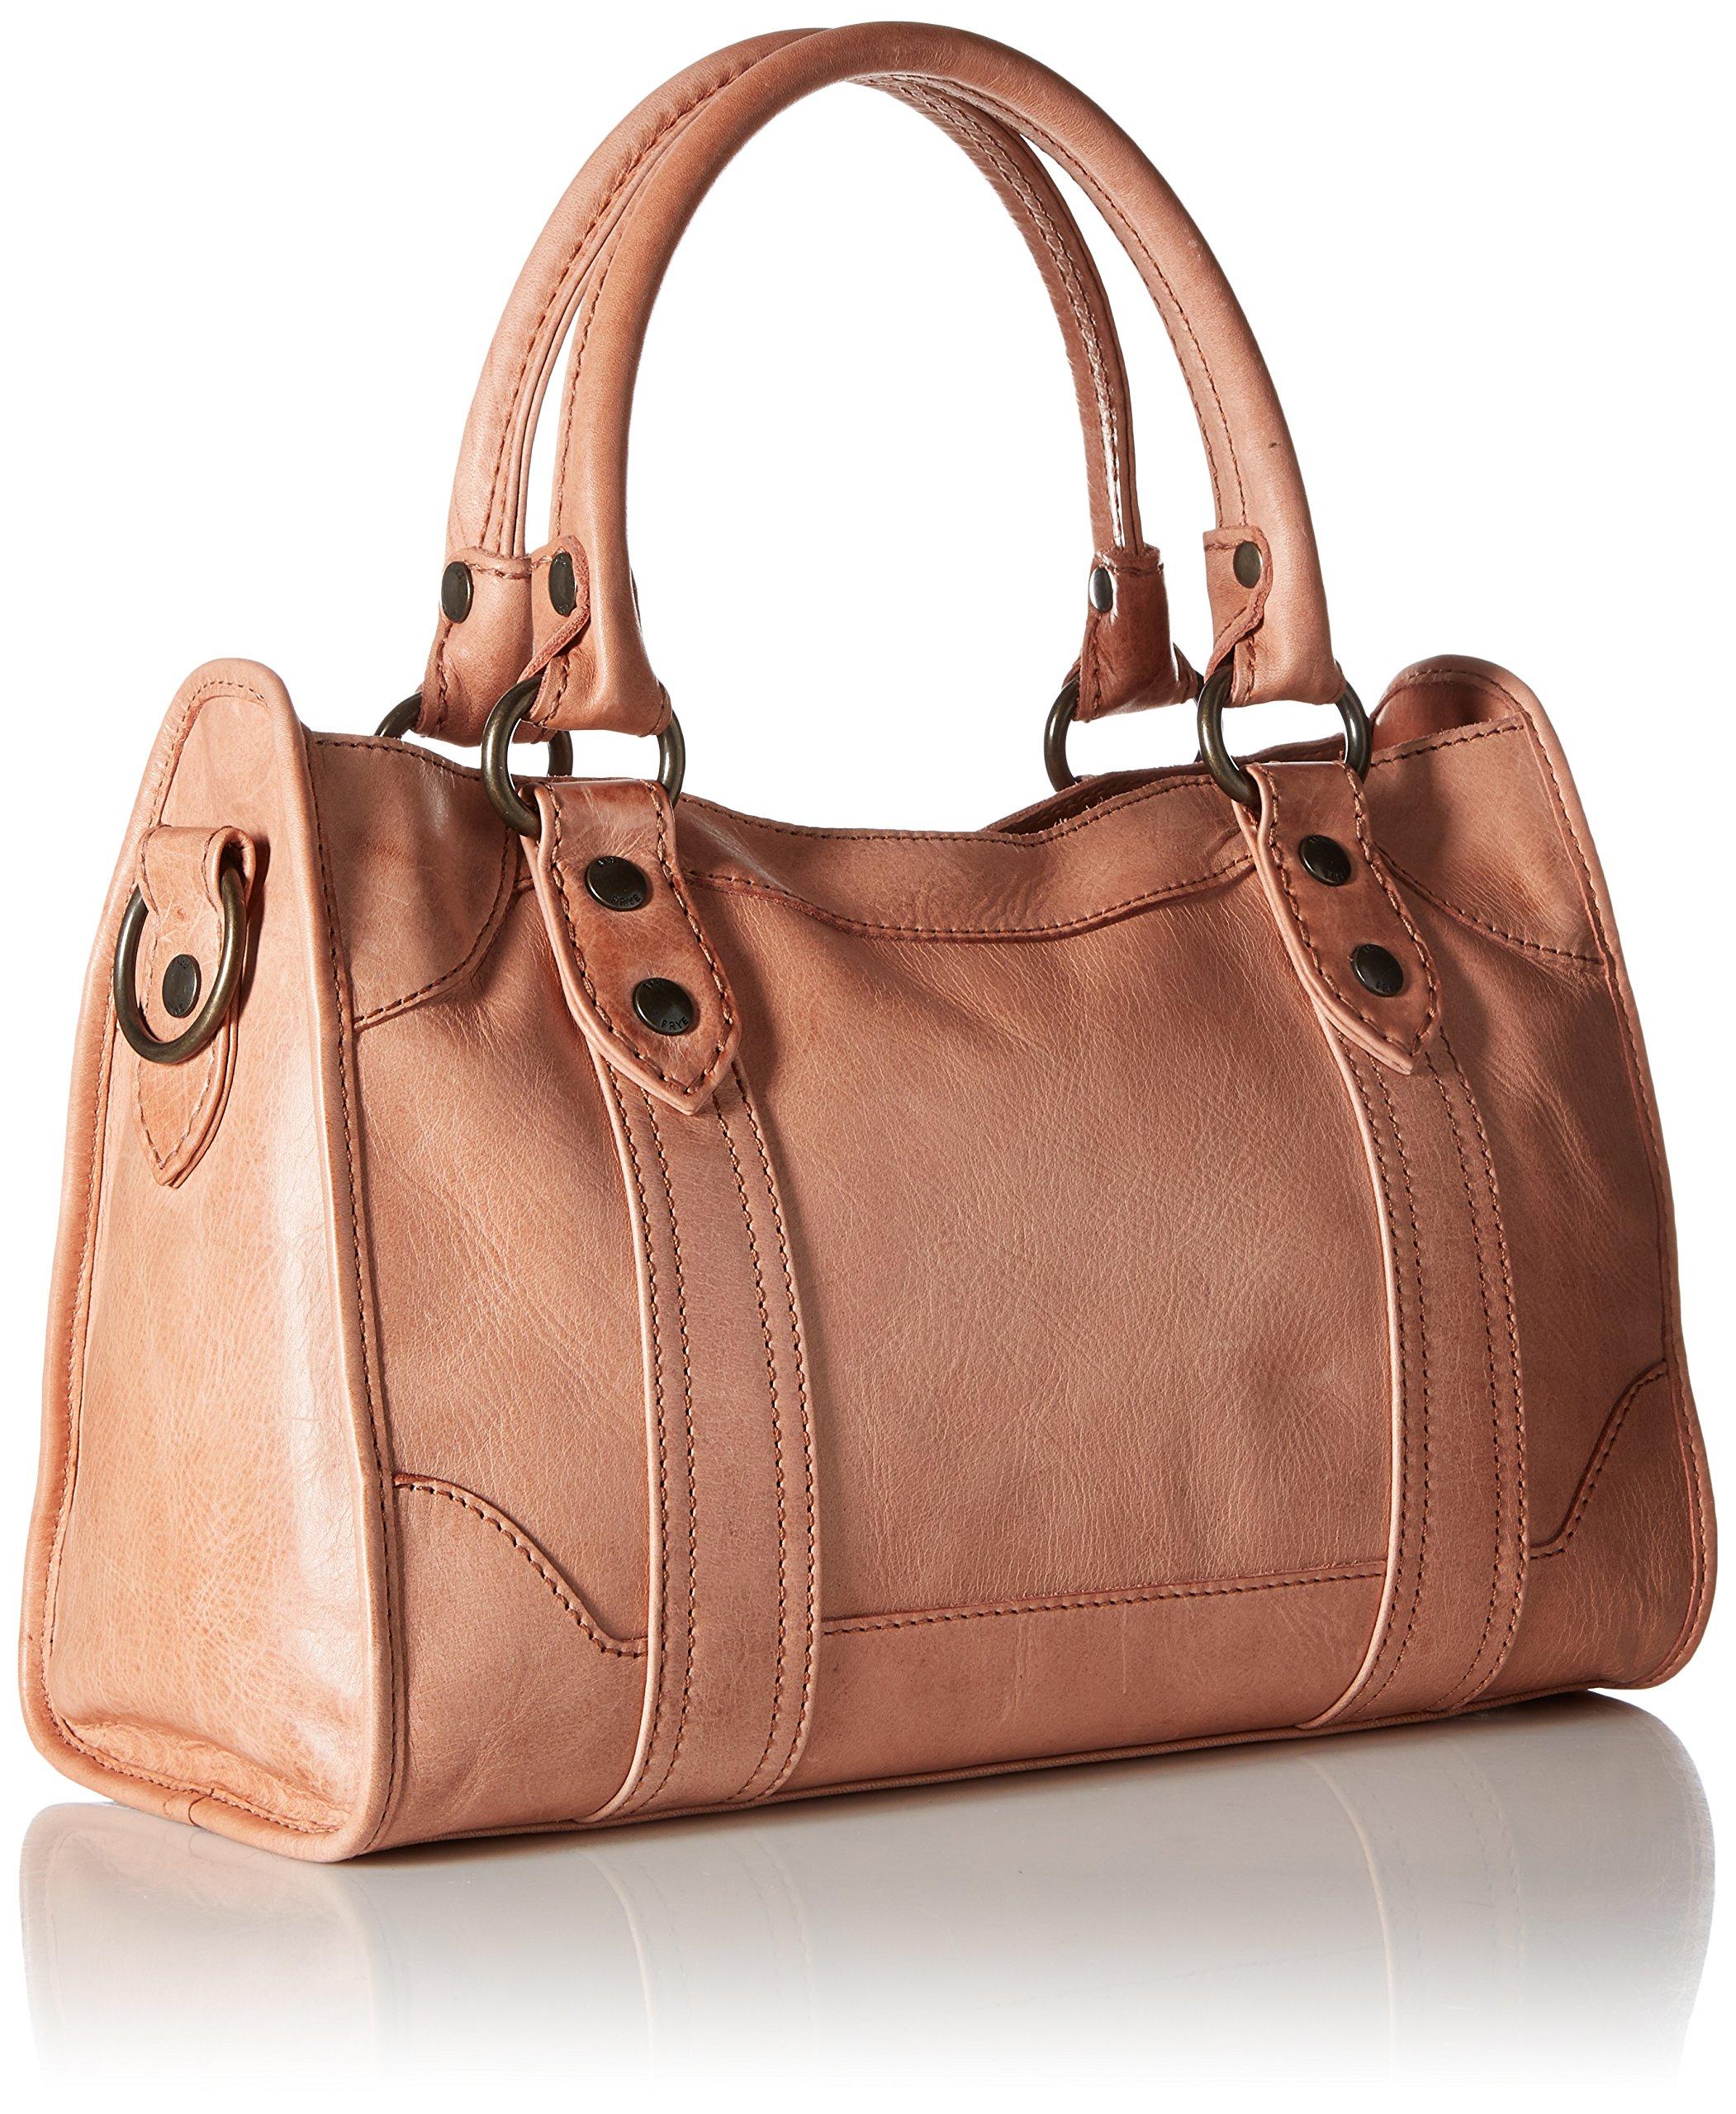 FRYE Melissa Zip Satchel Leather Handbag, dusty rose by FRYE (Image #2)